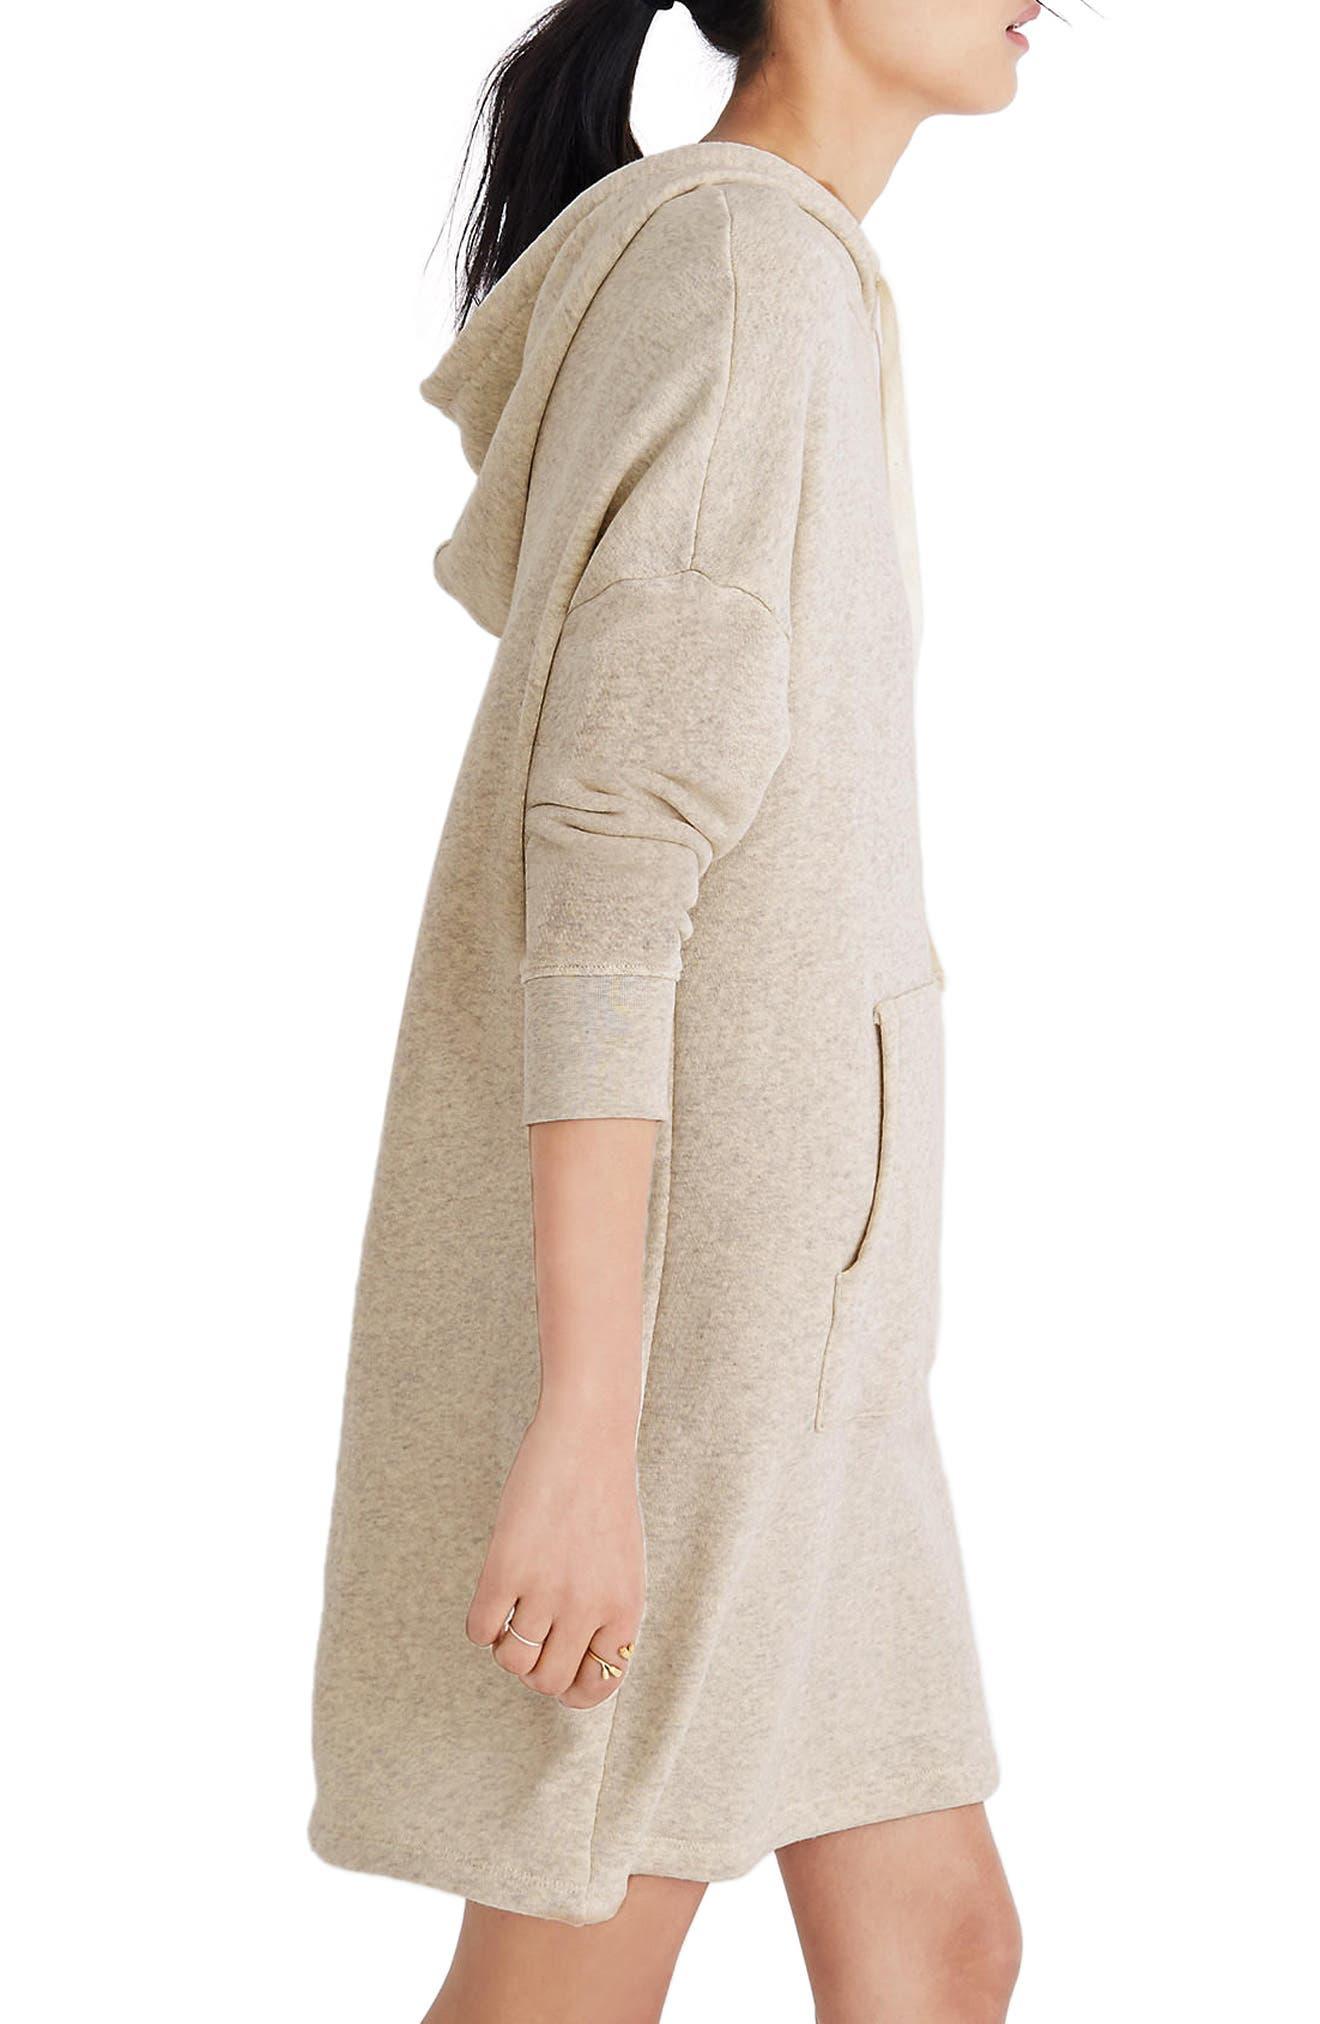 Hooded Sweatshirt Dress,                             Alternate thumbnail 3, color,                             020